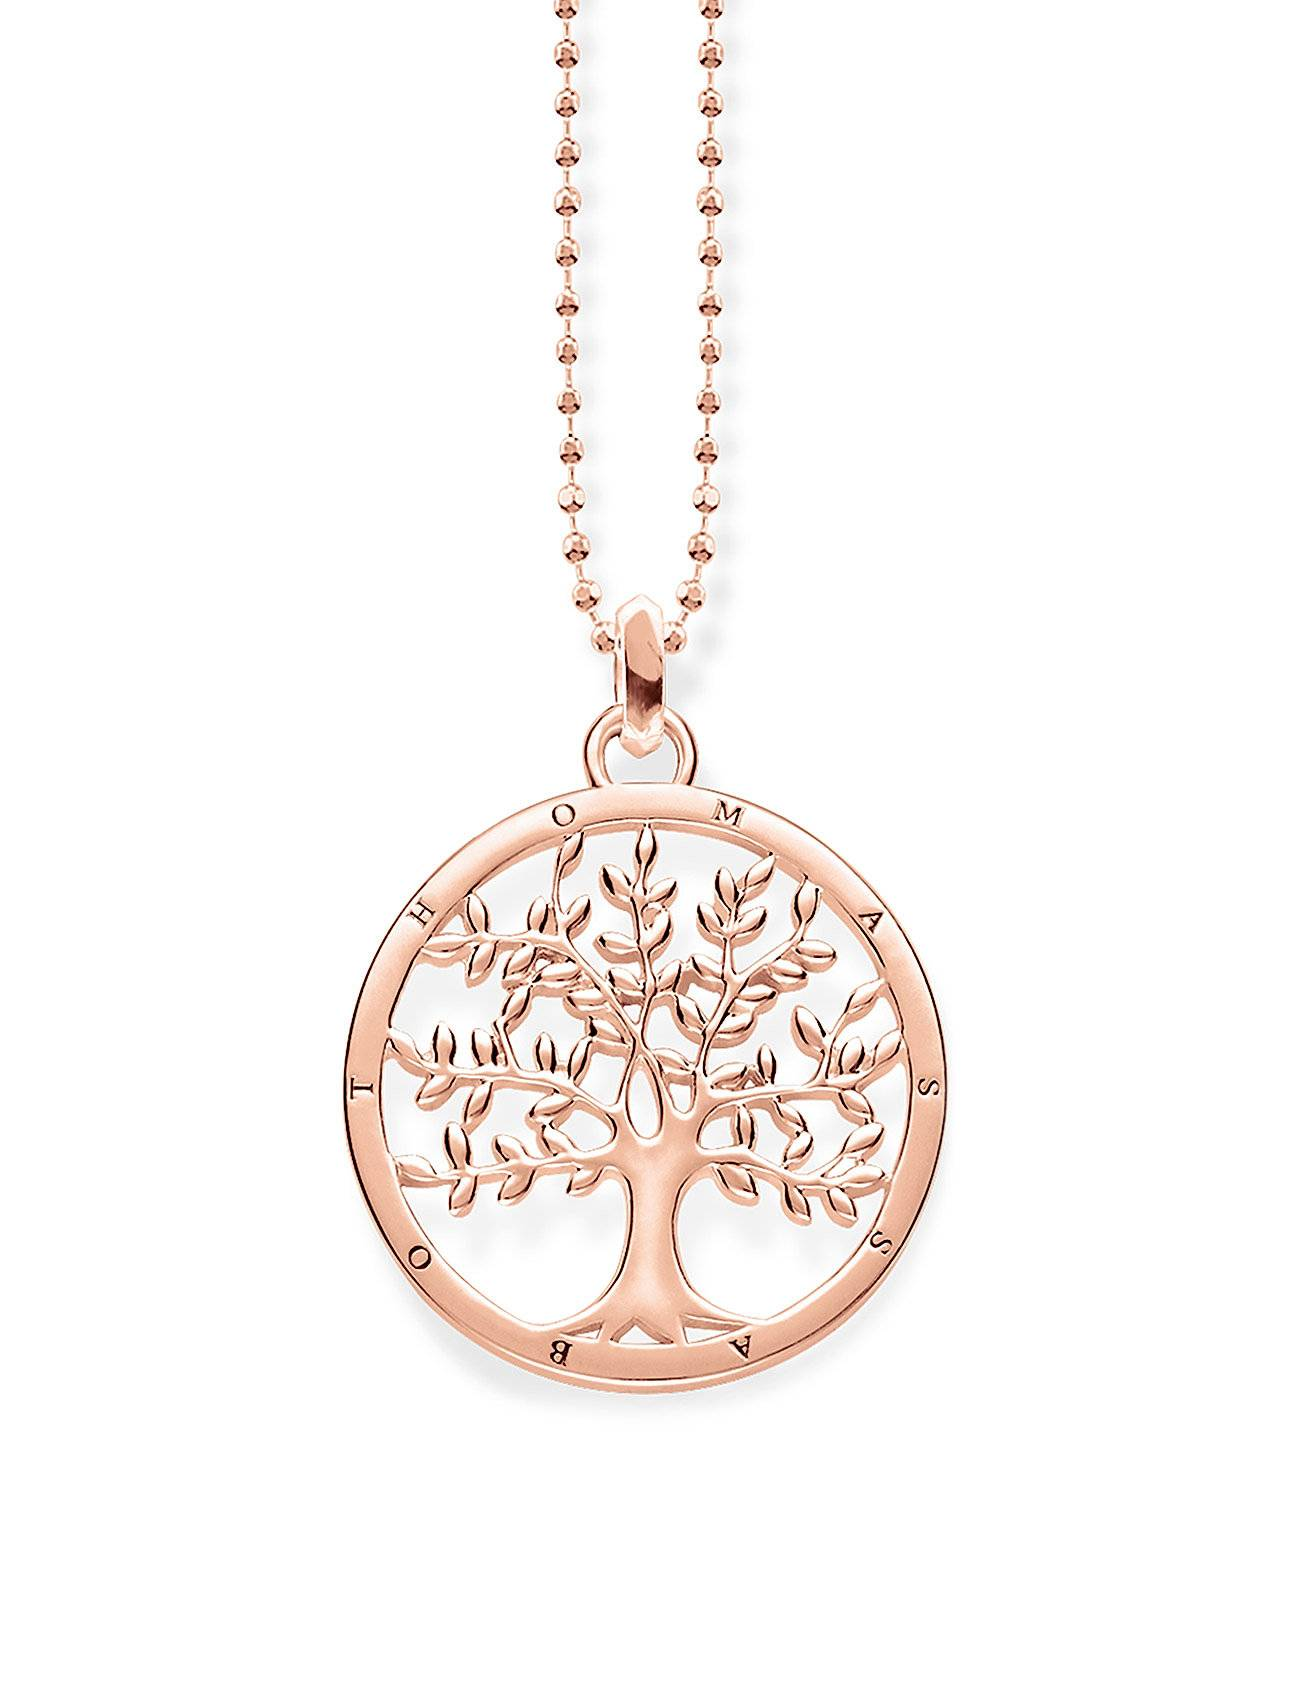 Thomas Sabo Necklace Tree Of Love Accessories Jewellery Necklaces Dainty Necklaces Kulta Thomas Sabo